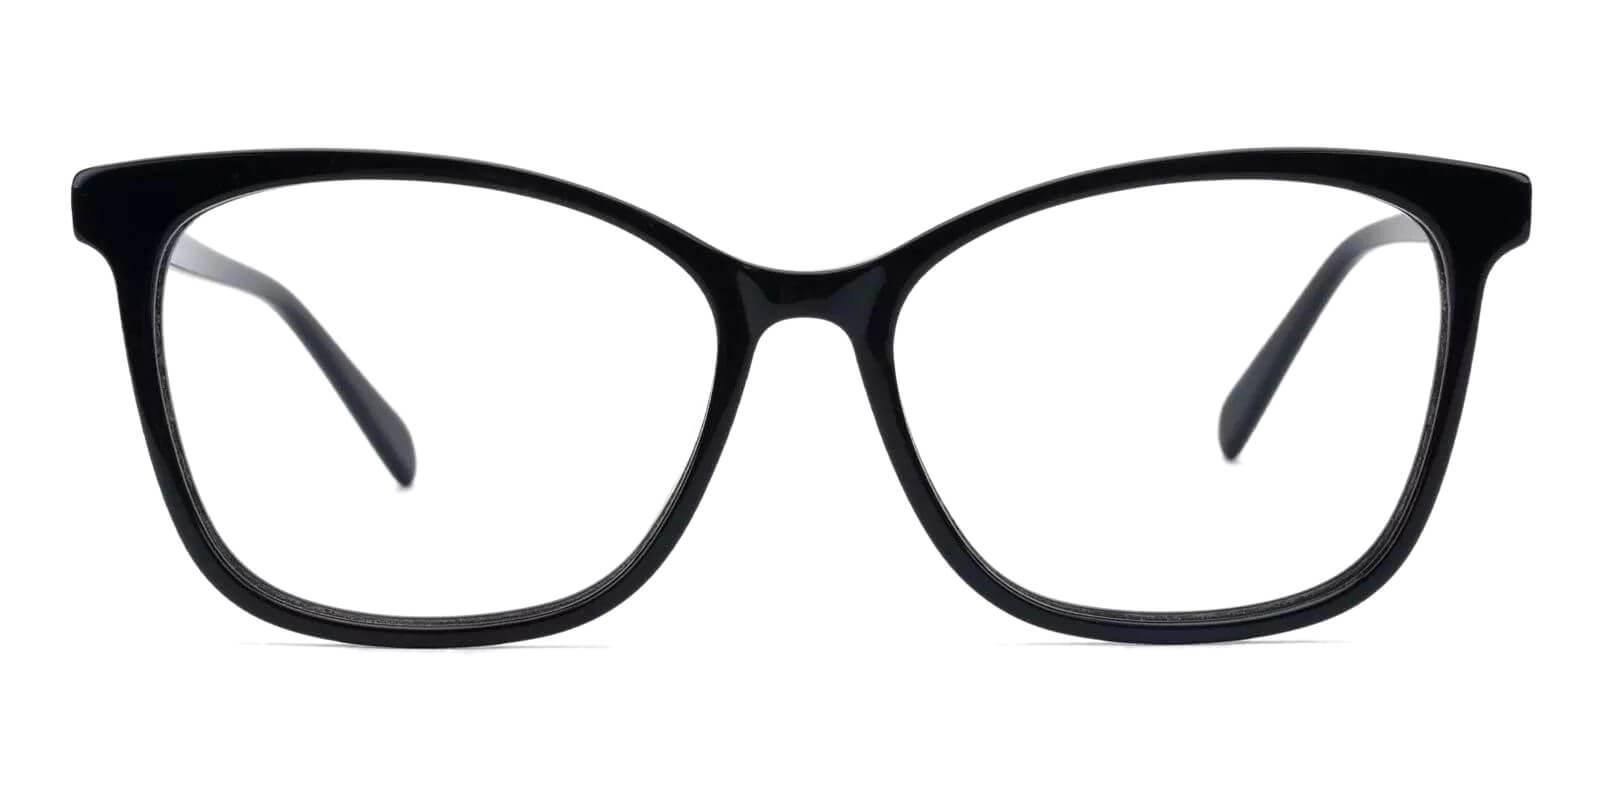 Coliny Black Acetate Eyeglasses , Fashion , SpringHinges , UniversalBridgeFit Frames from ABBE Glasses